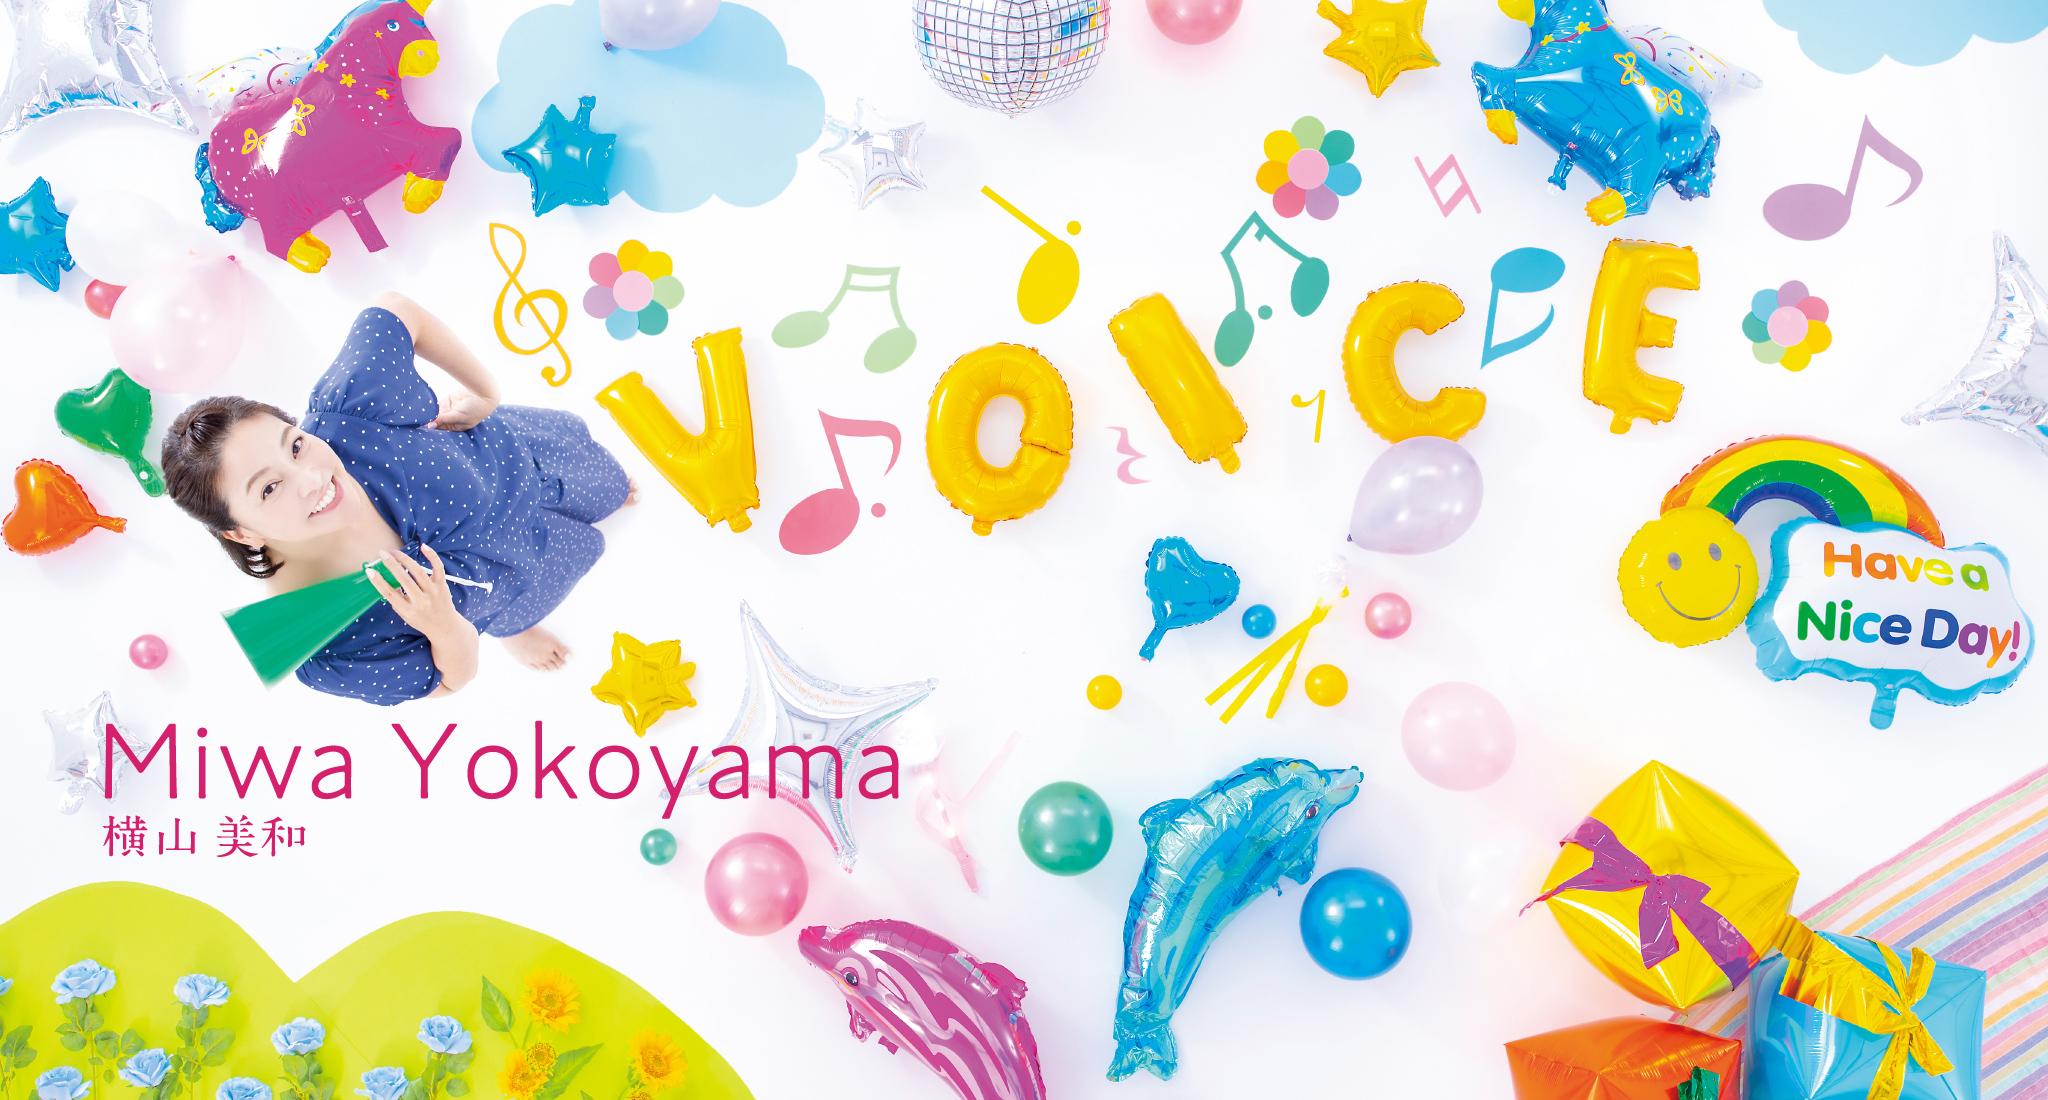 Miwa Yokoyama 横山美和